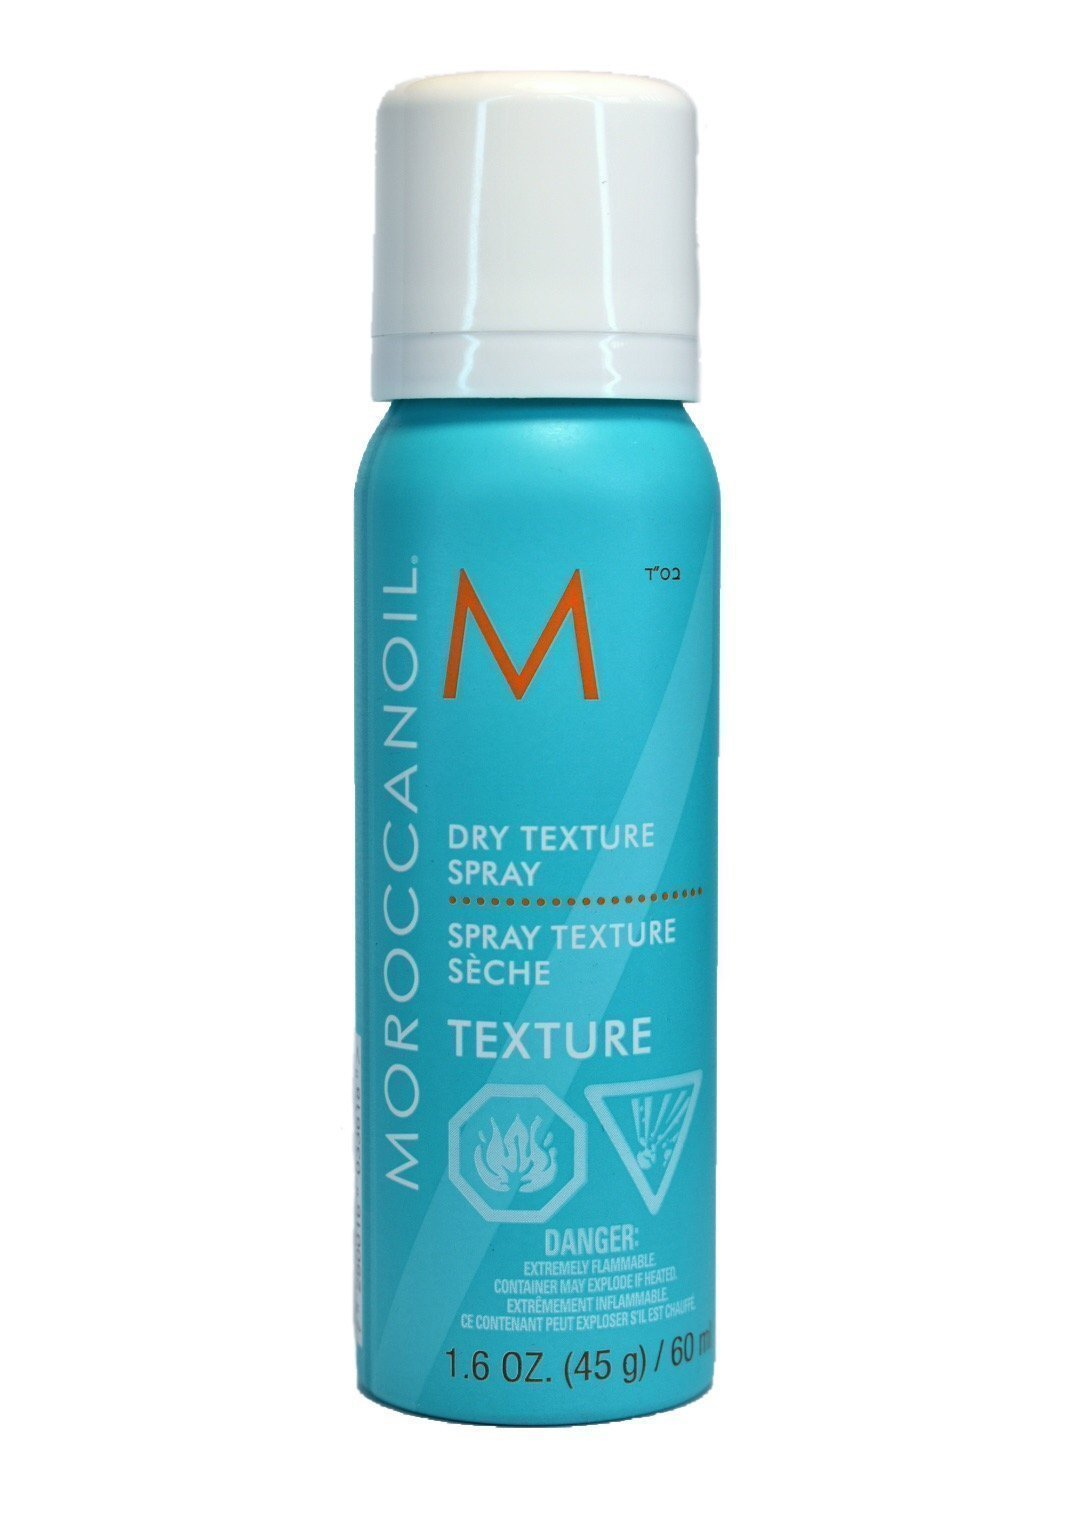 Kenra Dry Texture Spray Travel Size